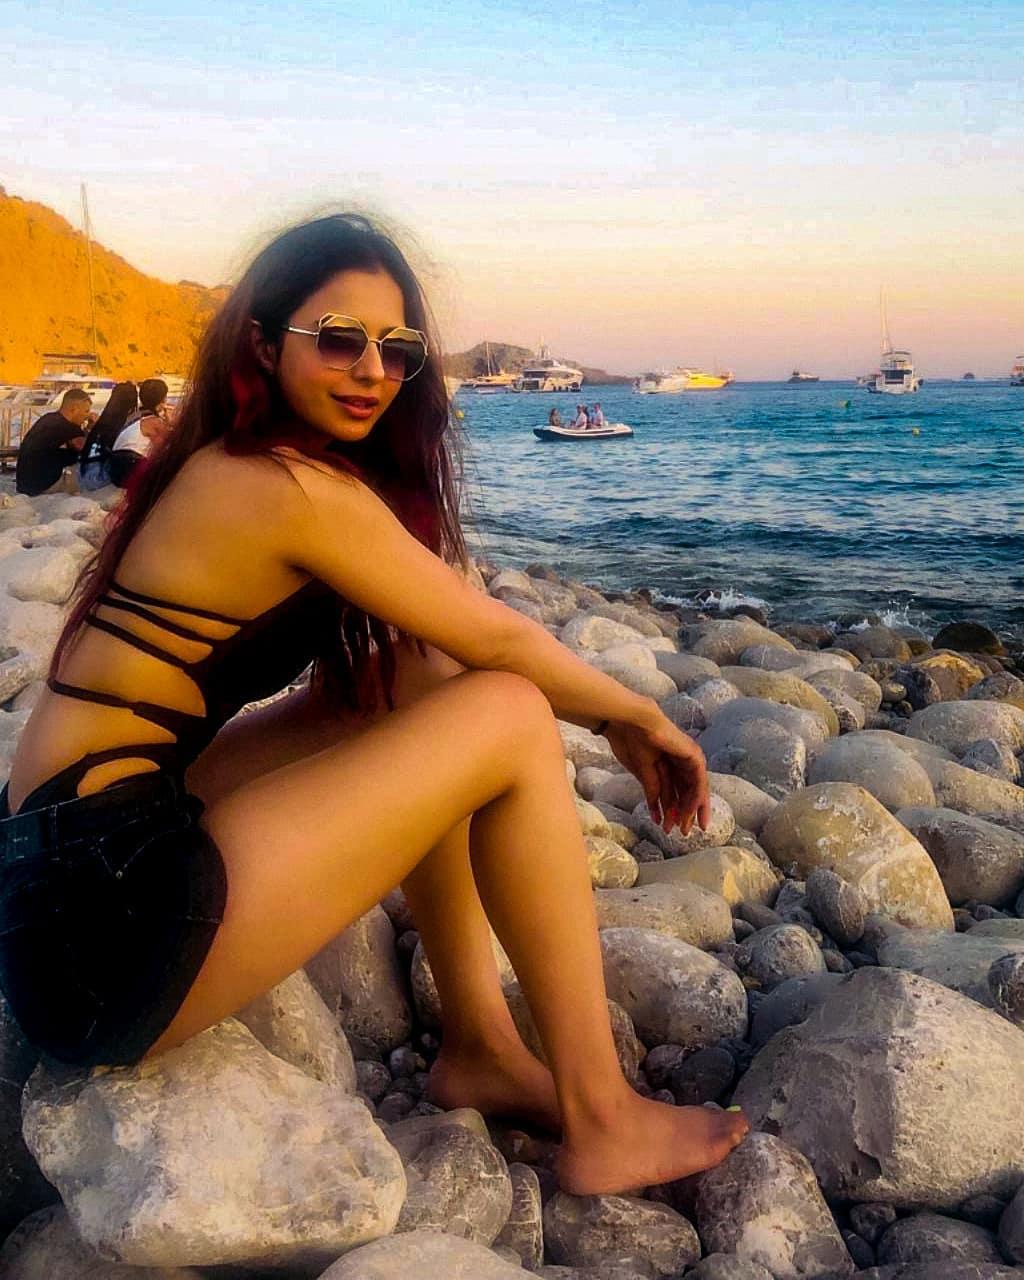 Rakul Preet Singh Hot Photos: Rakul Preet Singh sizzles in a bikini on the  beaches of Ibiza. See pics